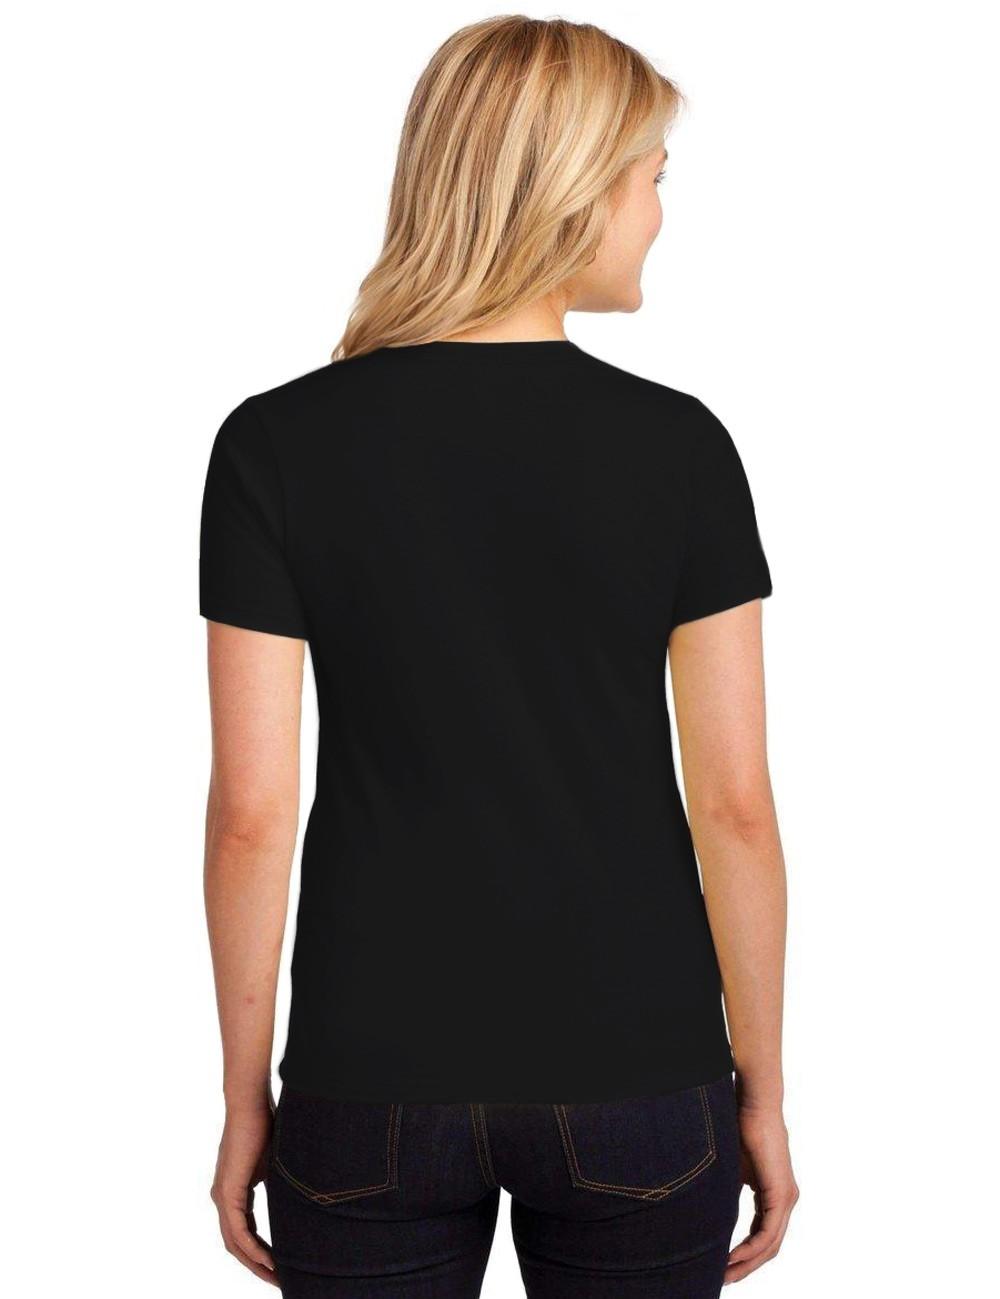 Camiseta Feminina T-Shirt Lisa Algodão Básica